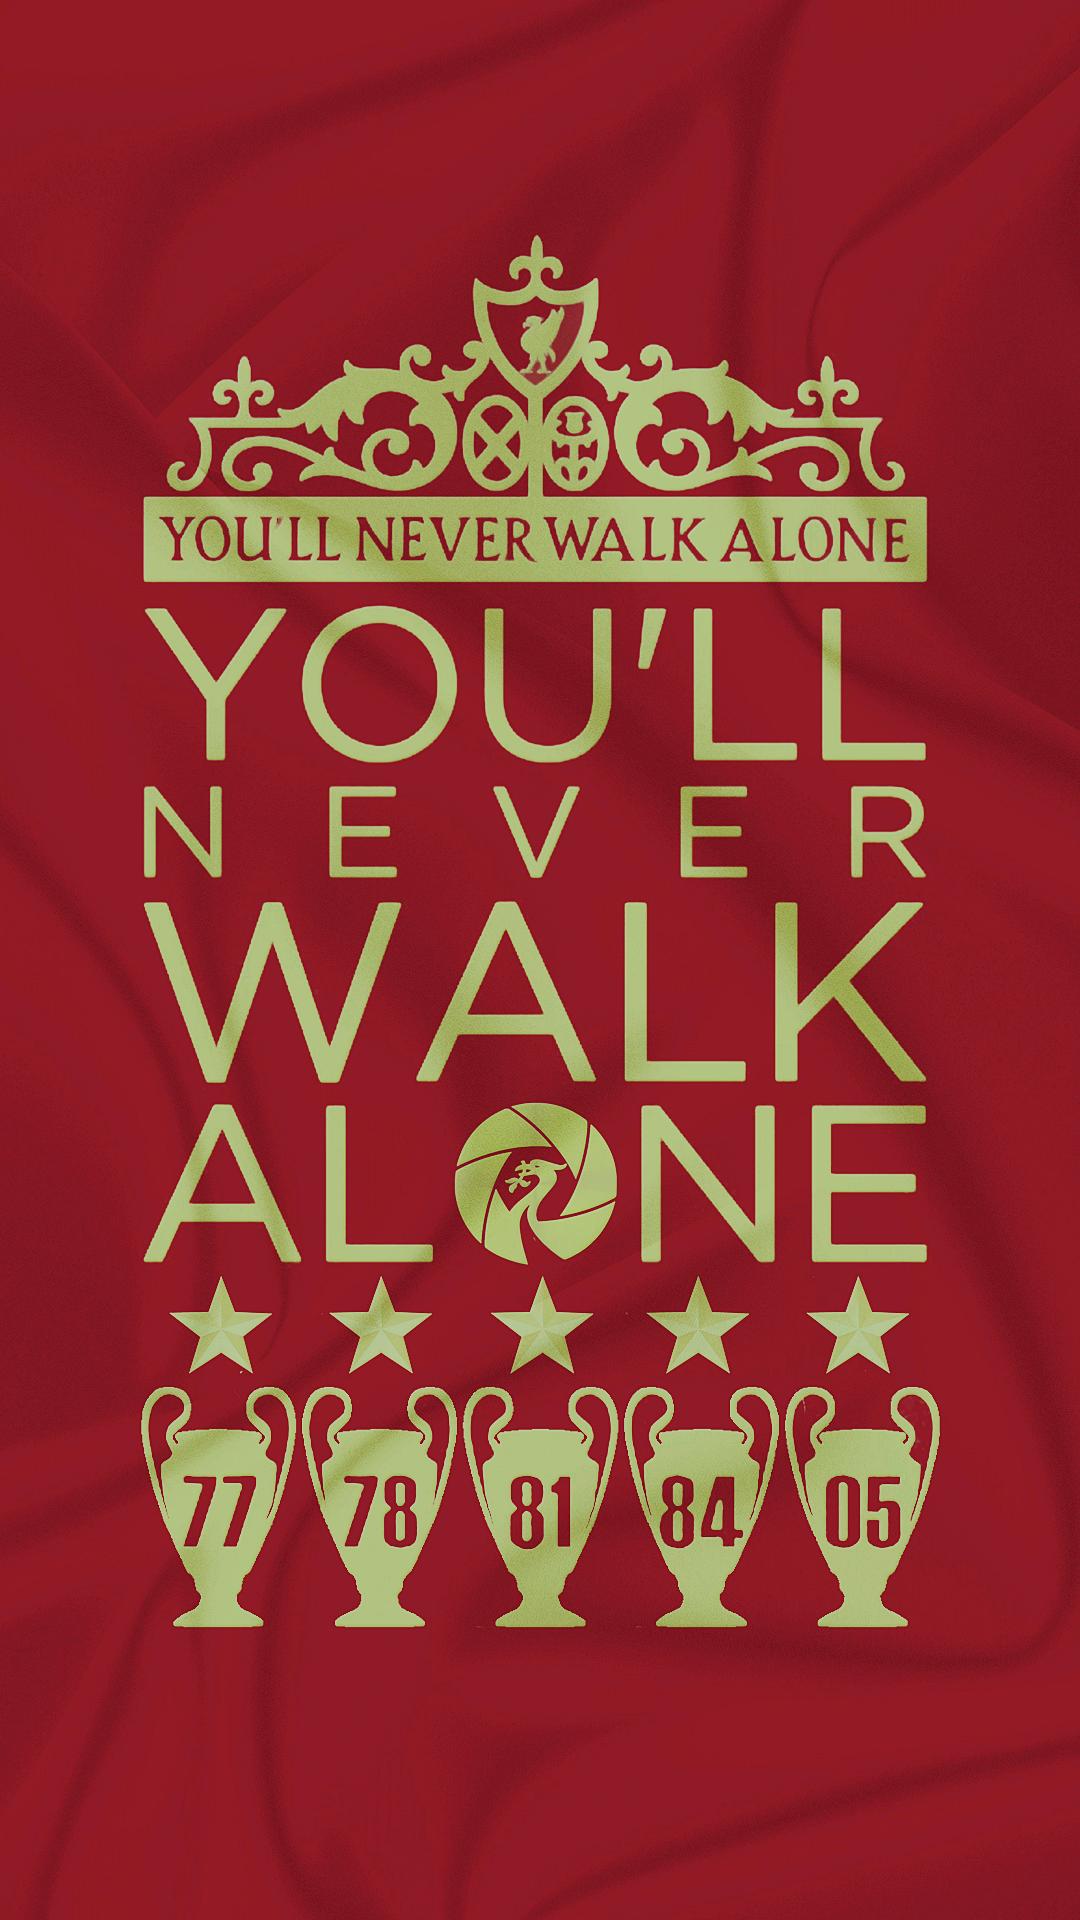 Ynwa Liverpool Poster Liverpool Fc Wallpaper Liverpool Liverpool Fc 1318672 Hd Wallpaper Backgrounds Download